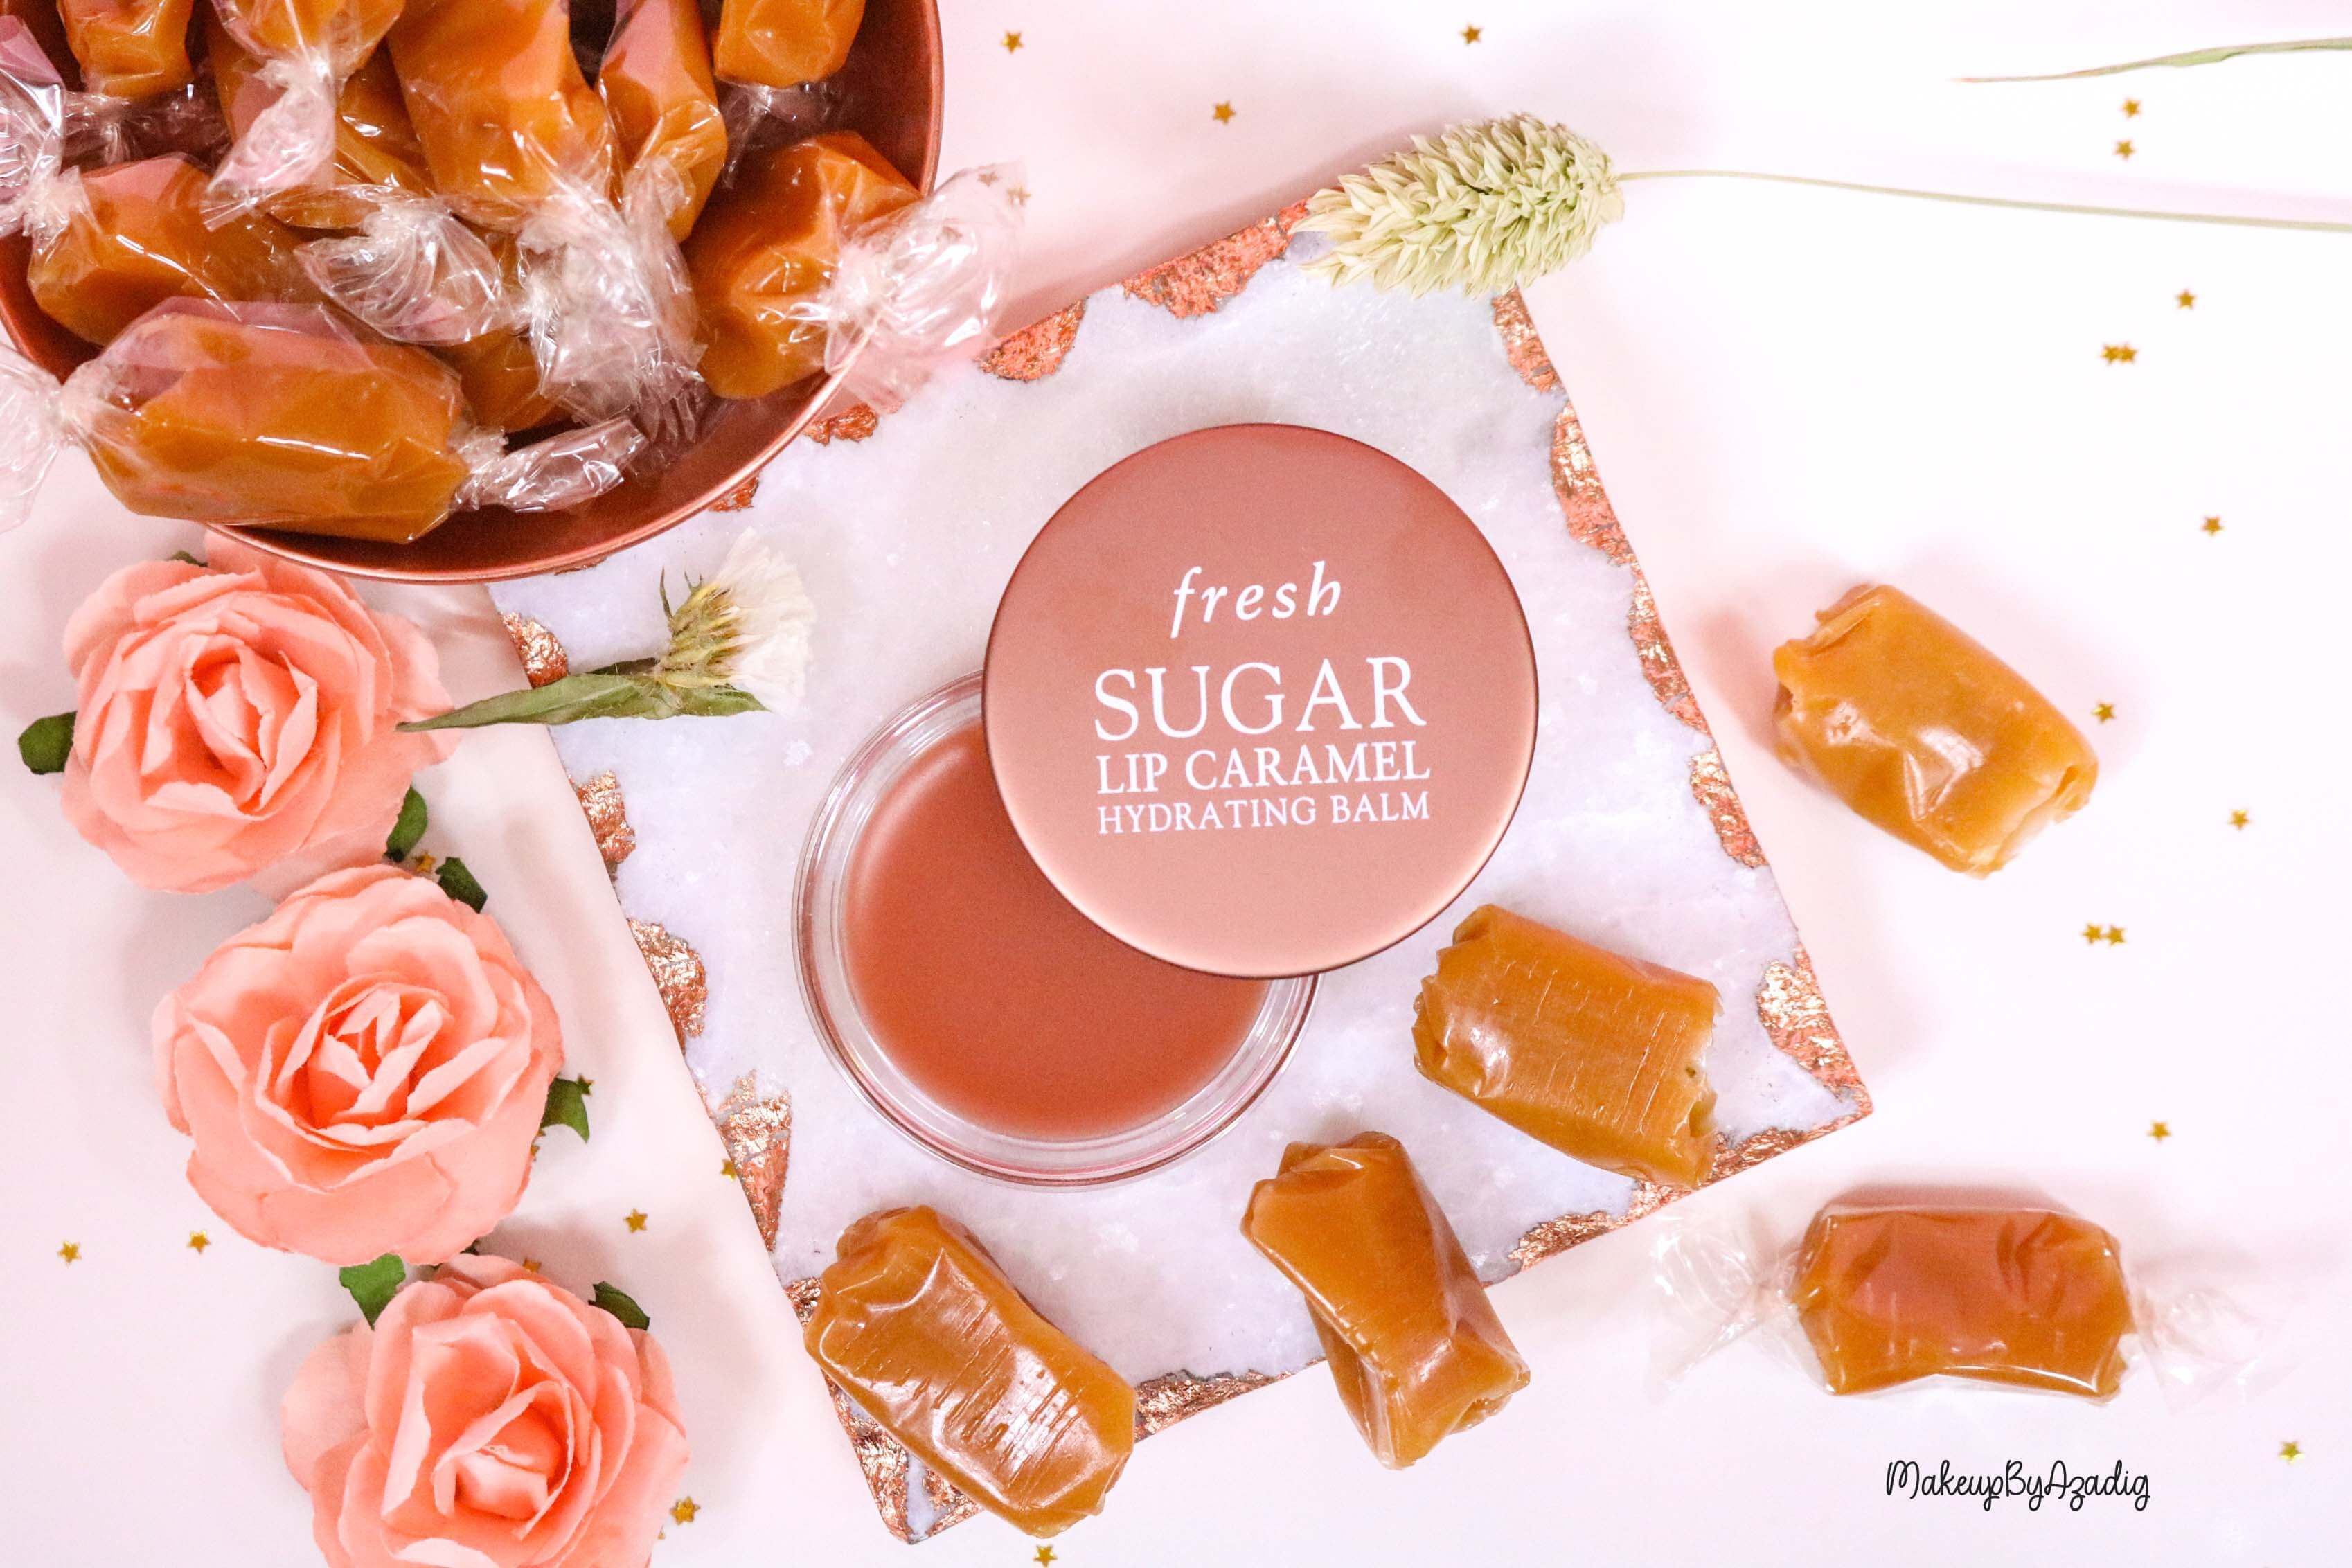 revue-baume-sucre-fresh-beauty-skincare-caramel-sugar-lip-caramel-sephora-makeupbyazadig-avis-prix-balm-food